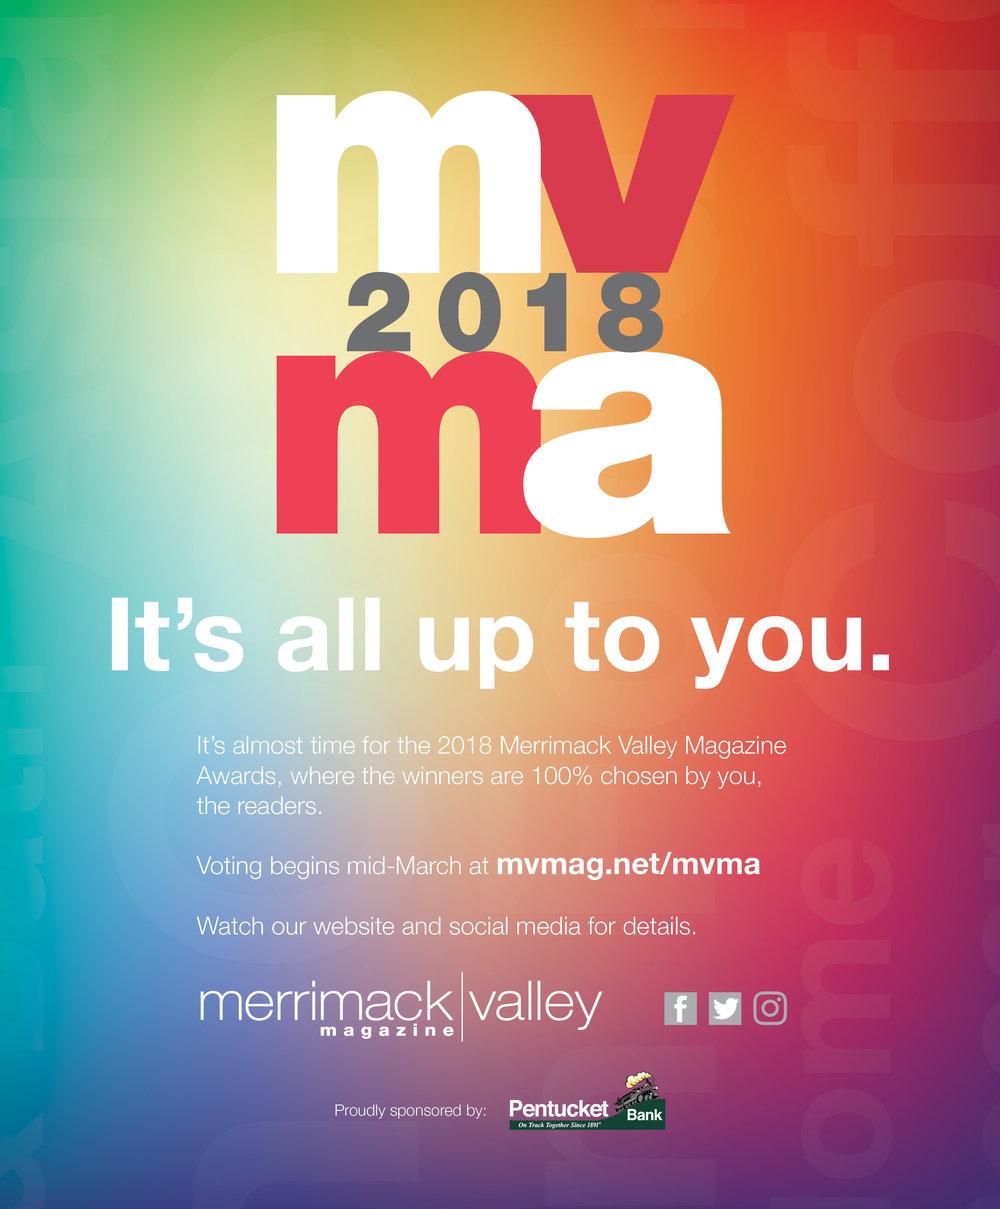 Print Ad Design   MVMA House Ad, Merrimack Valley Magazine